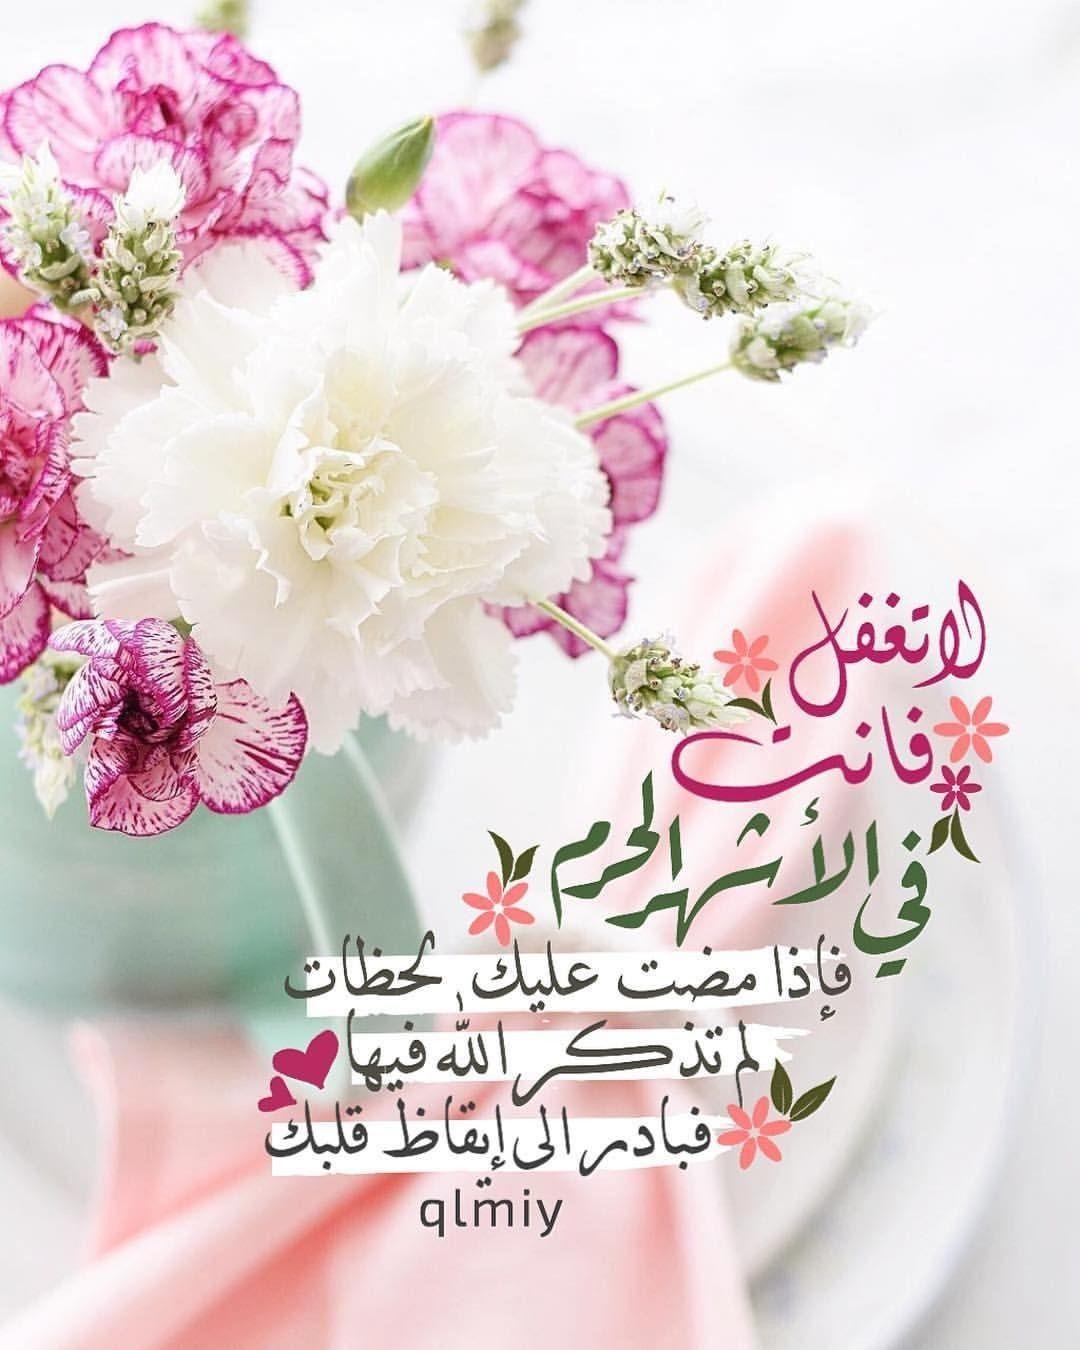 الاشهر الحرم Islamic Pictures Quotes Islam